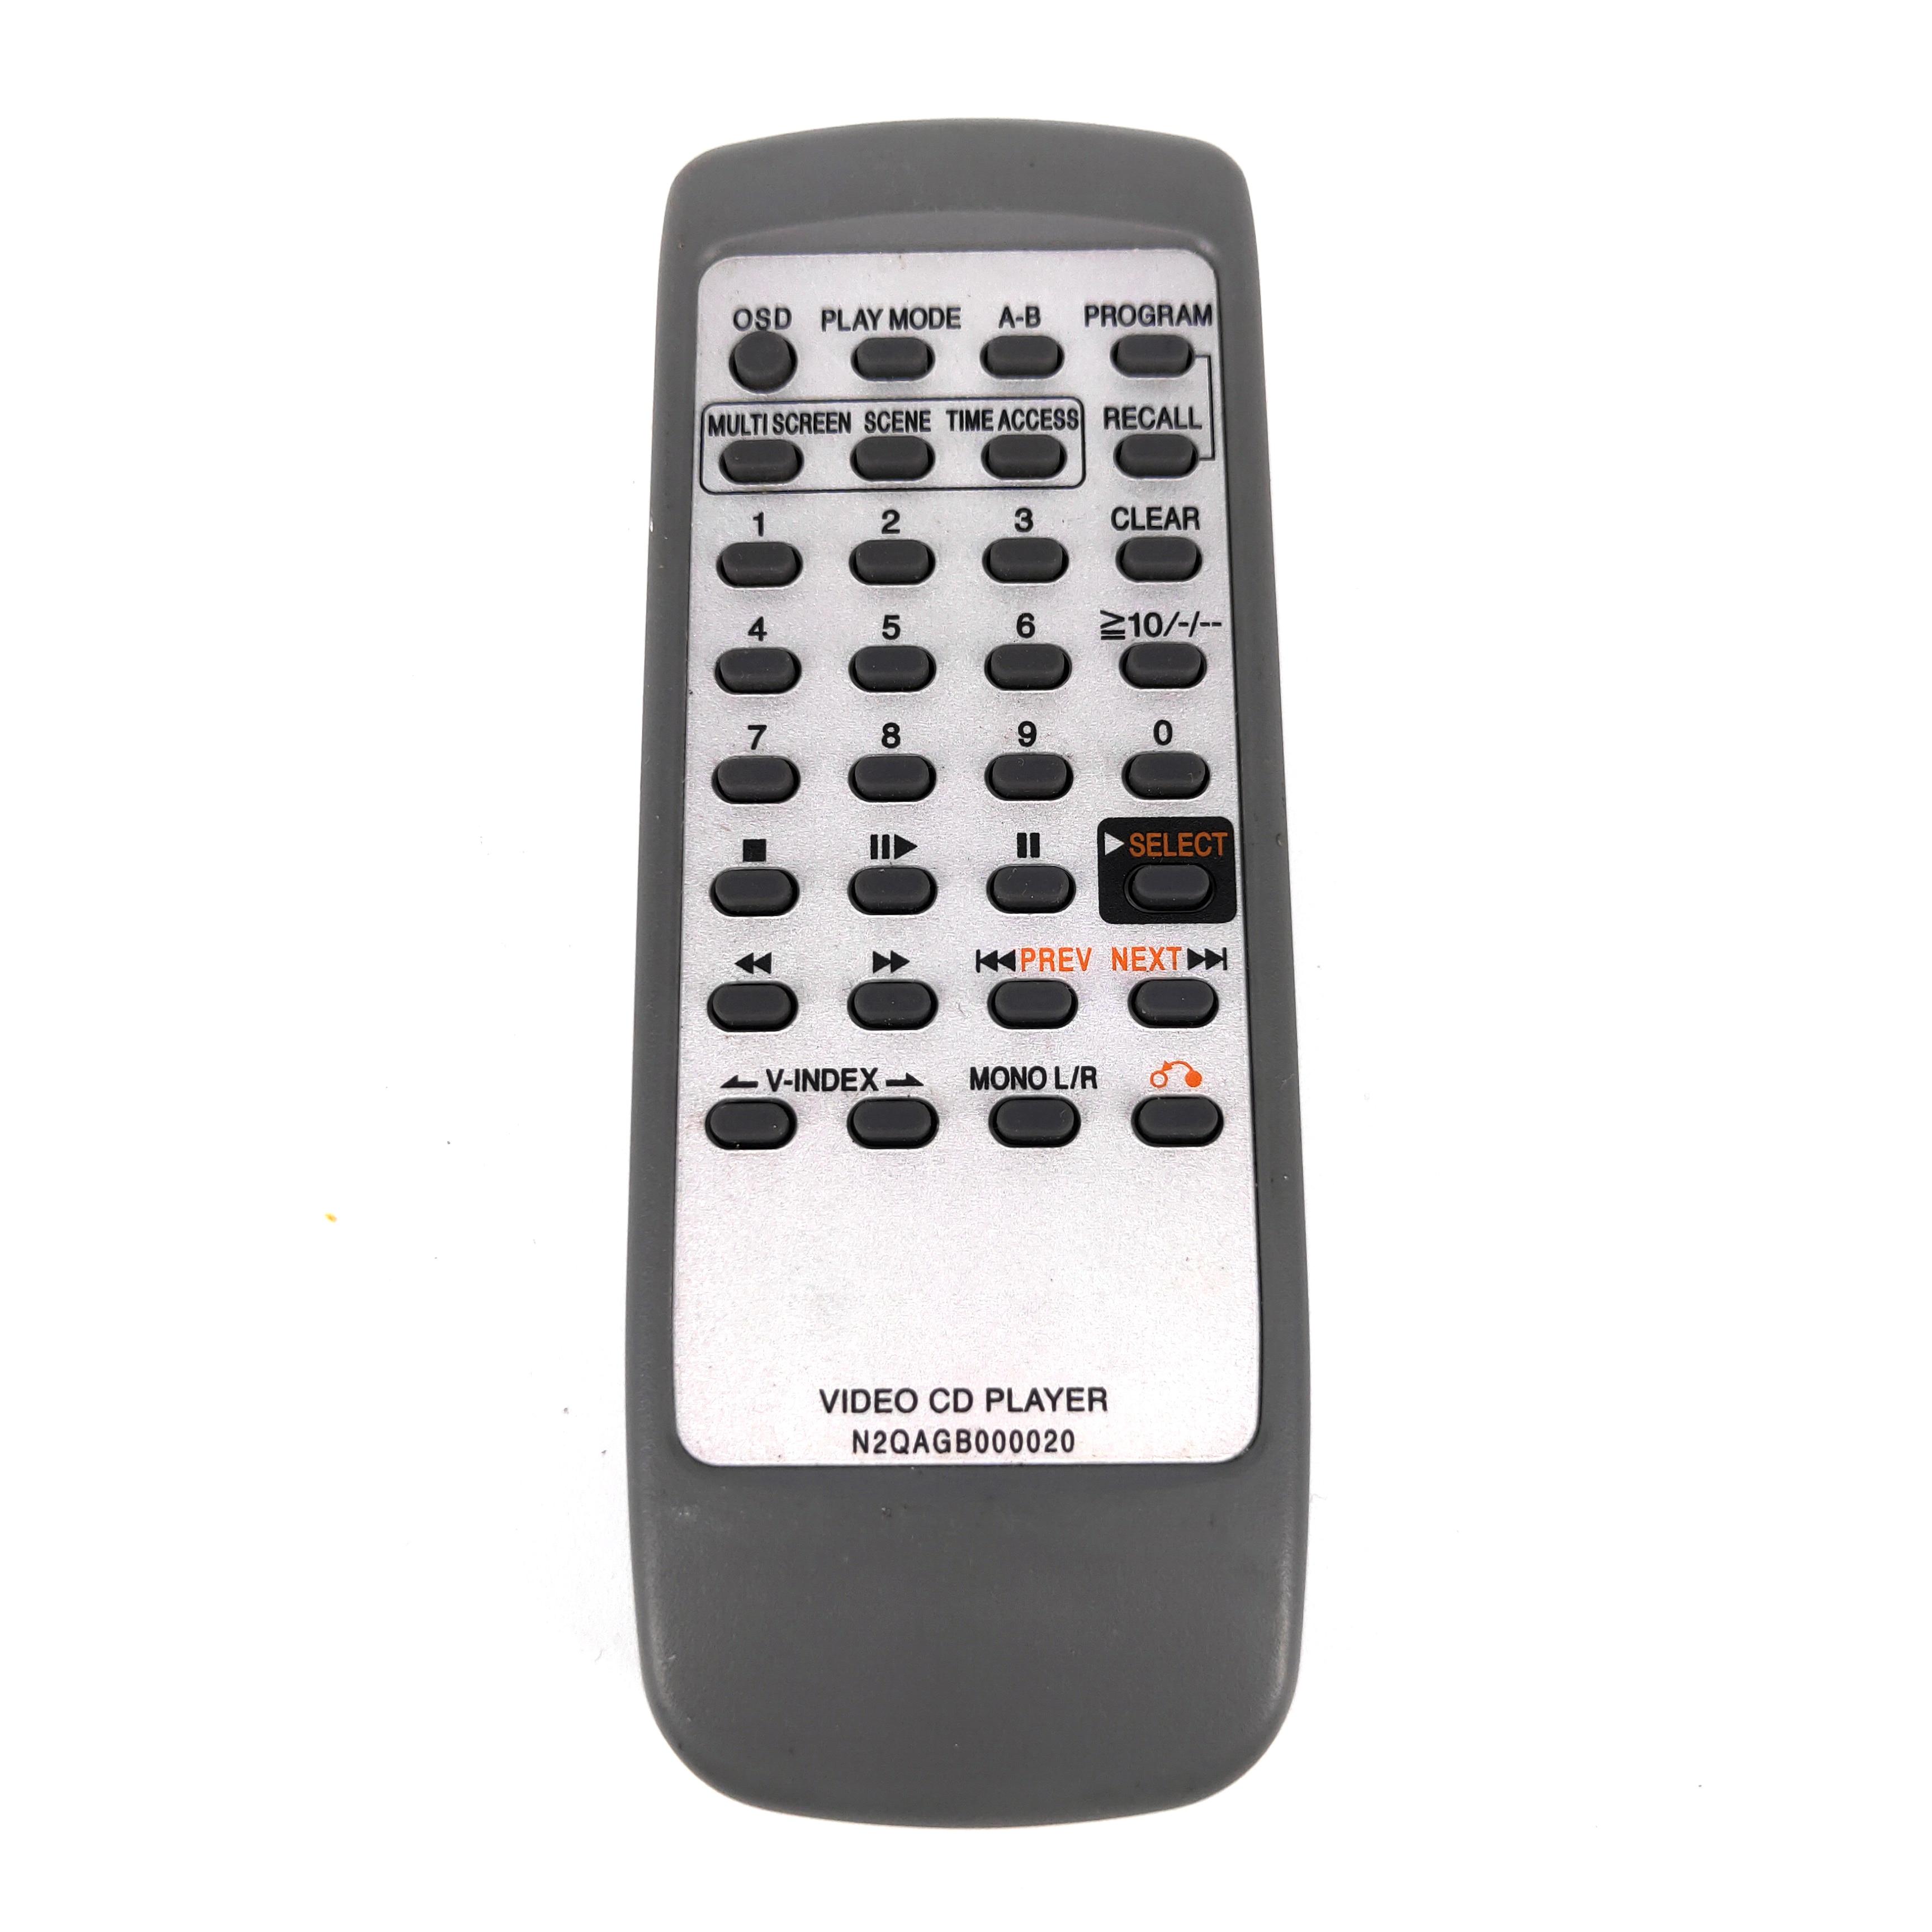 Nuevo Original para Panasonic VIDEO CD PLAYER control remoto N2QAGB000020 Fernbedienung